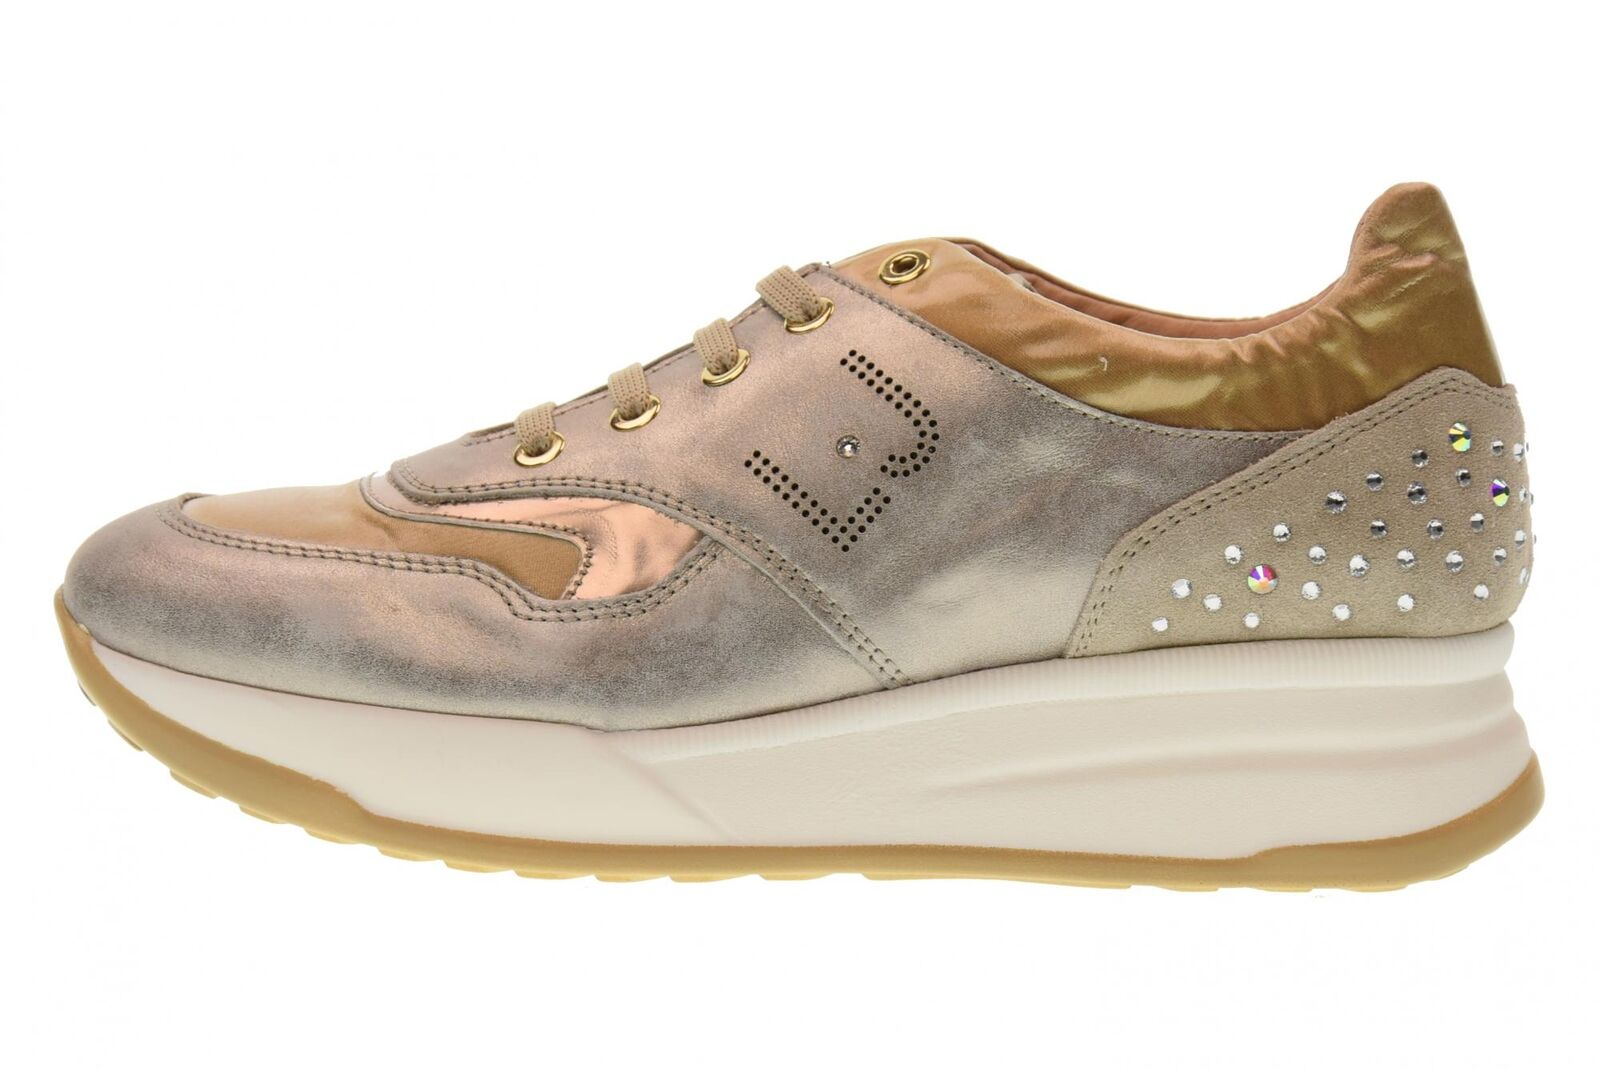 CO.co Shoes & Bags